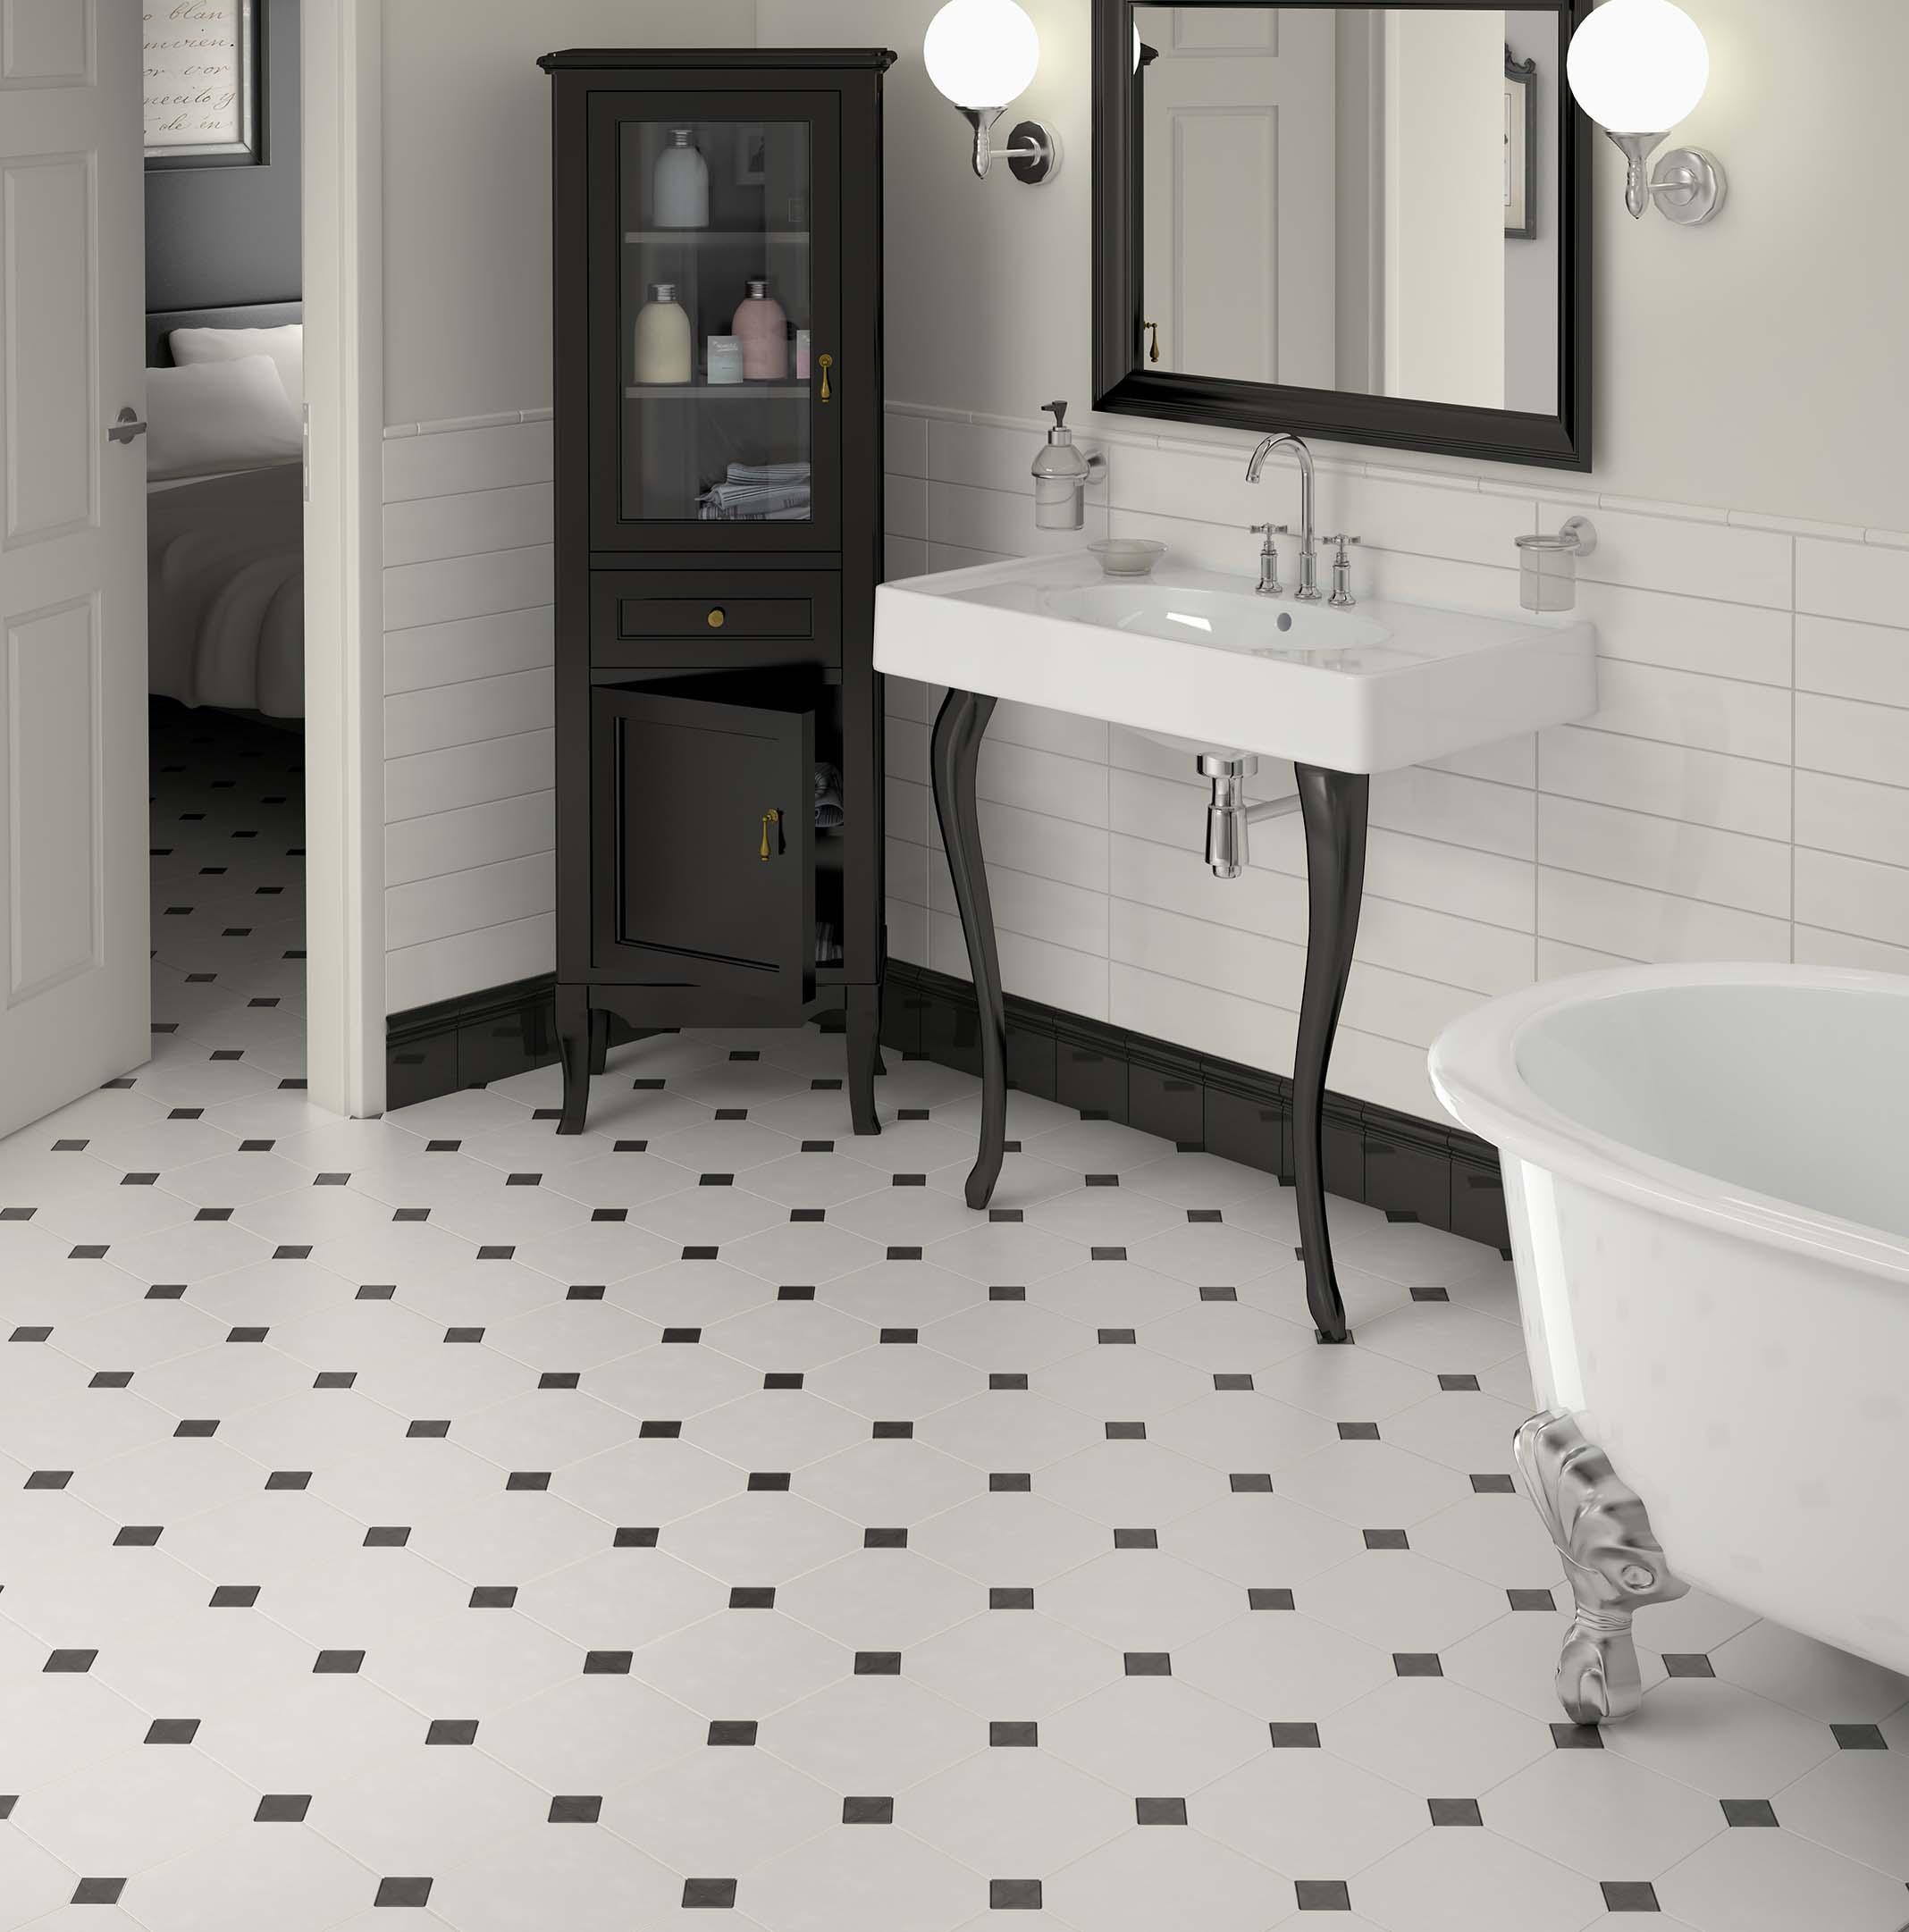 White octagonal floor tiles with black 'dot' inserts